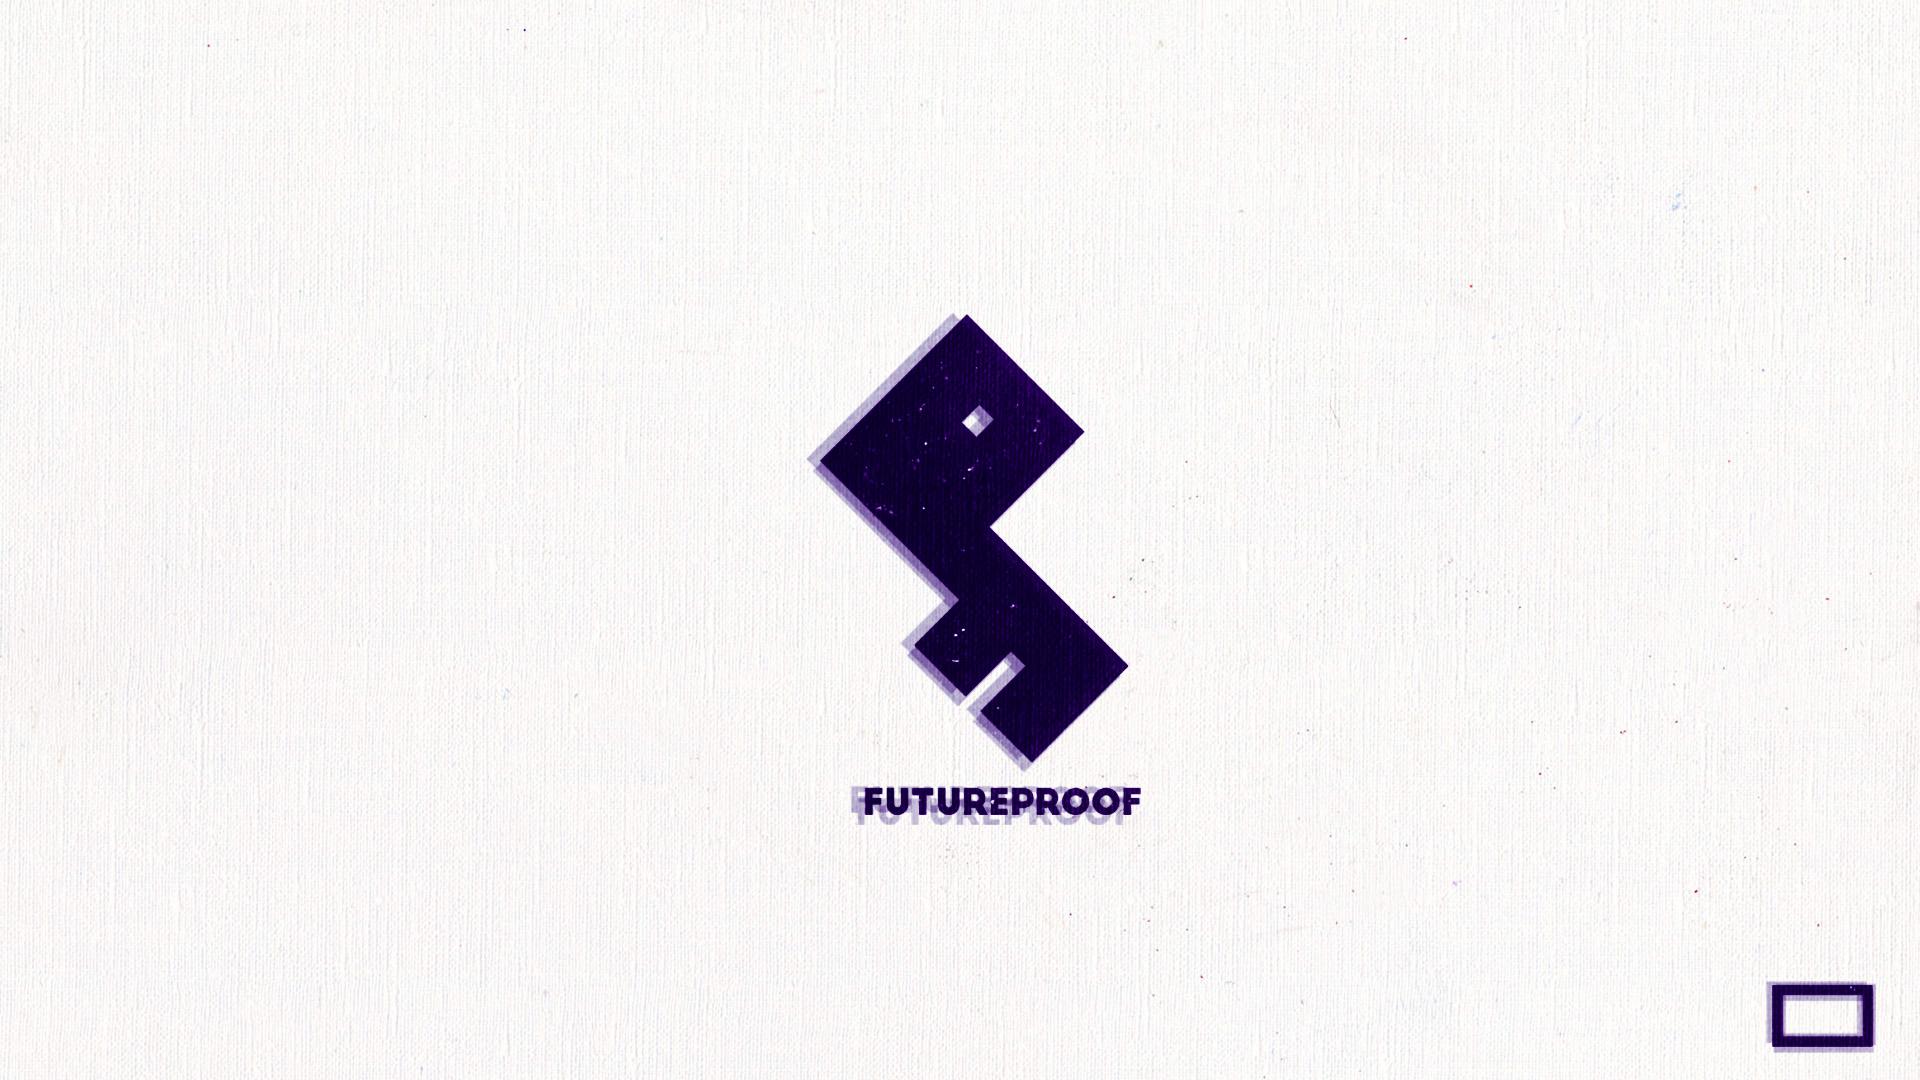 FutureProof_StyleFrames_v328.jpg